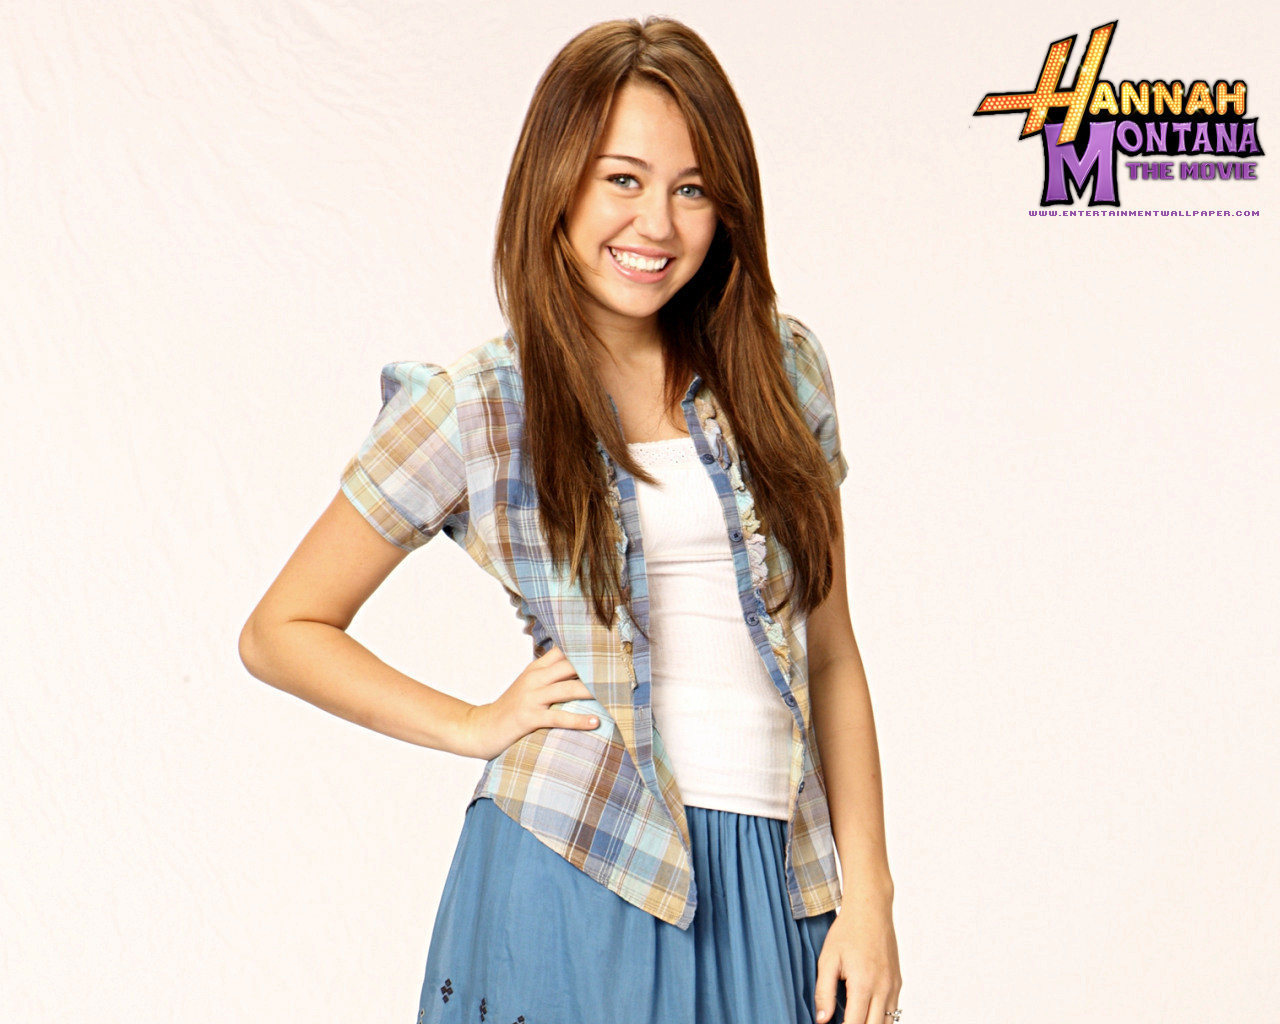 Miley Cyrus on Hannah Montana: 'She's buried in my backyard'